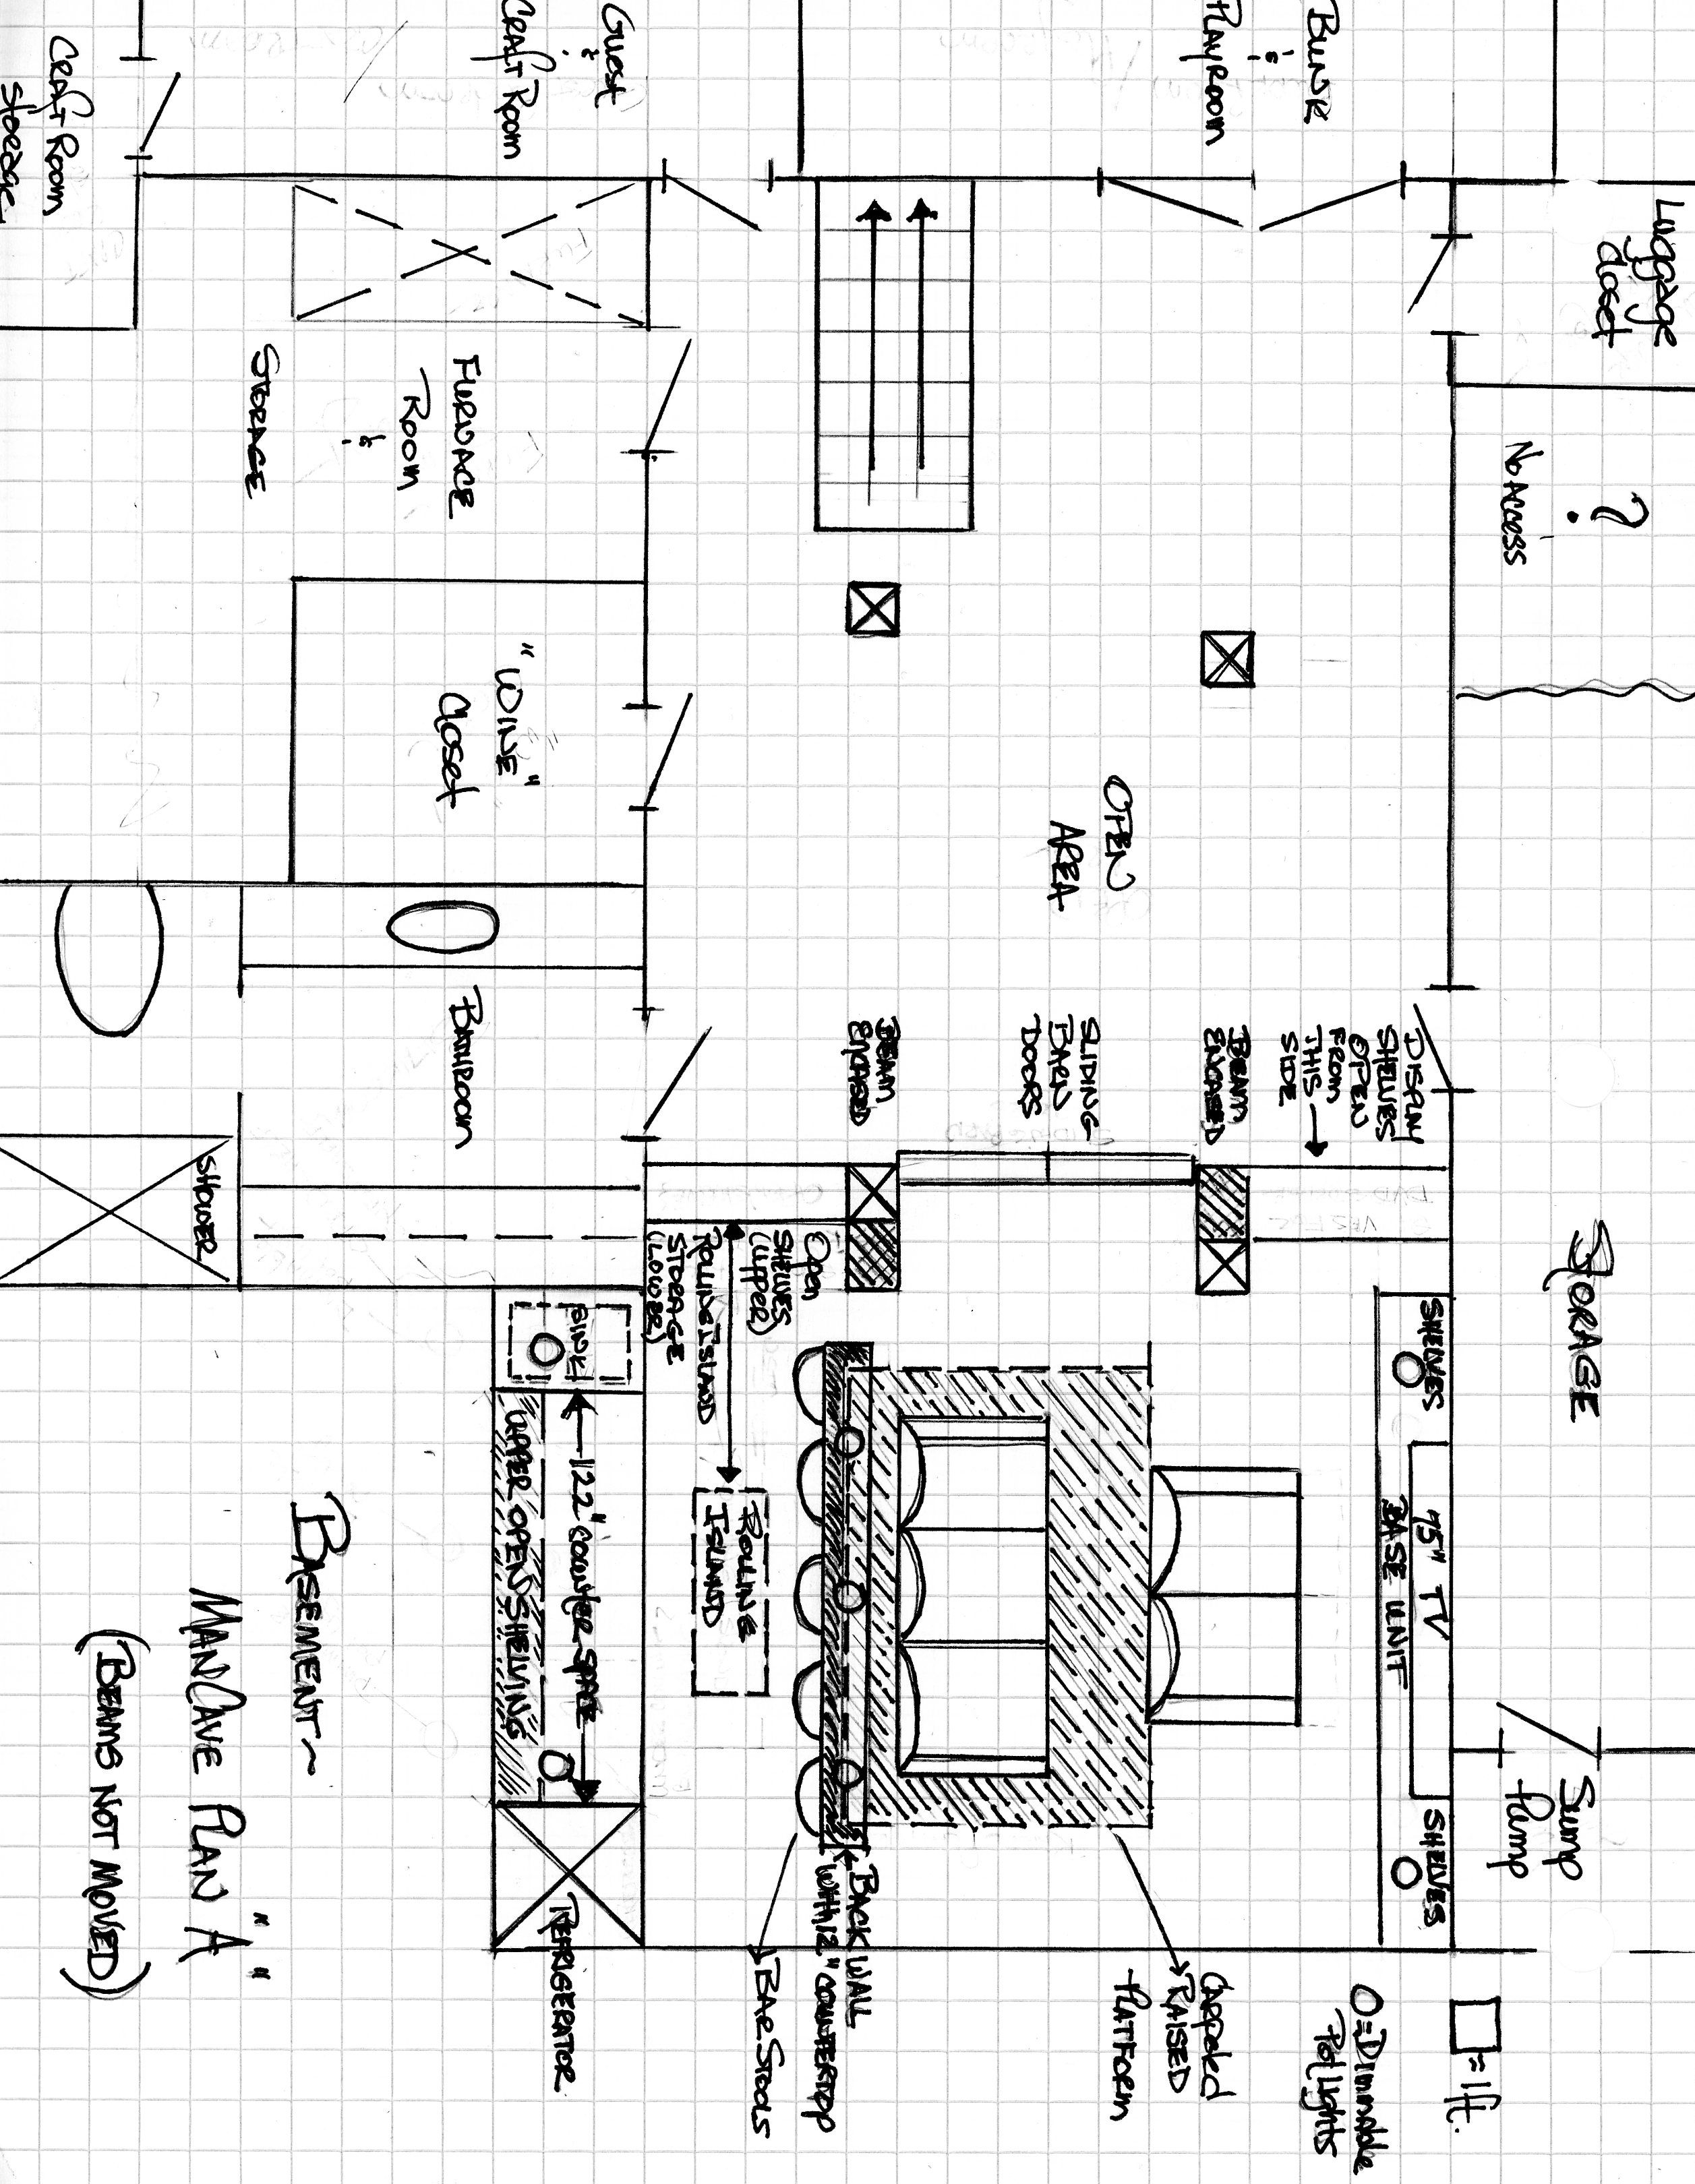 Stupendous Plan A Both Recliners Are Facing Tv Wall Possible Addition Creativecarmelina Interior Chair Design Creativecarmelinacom